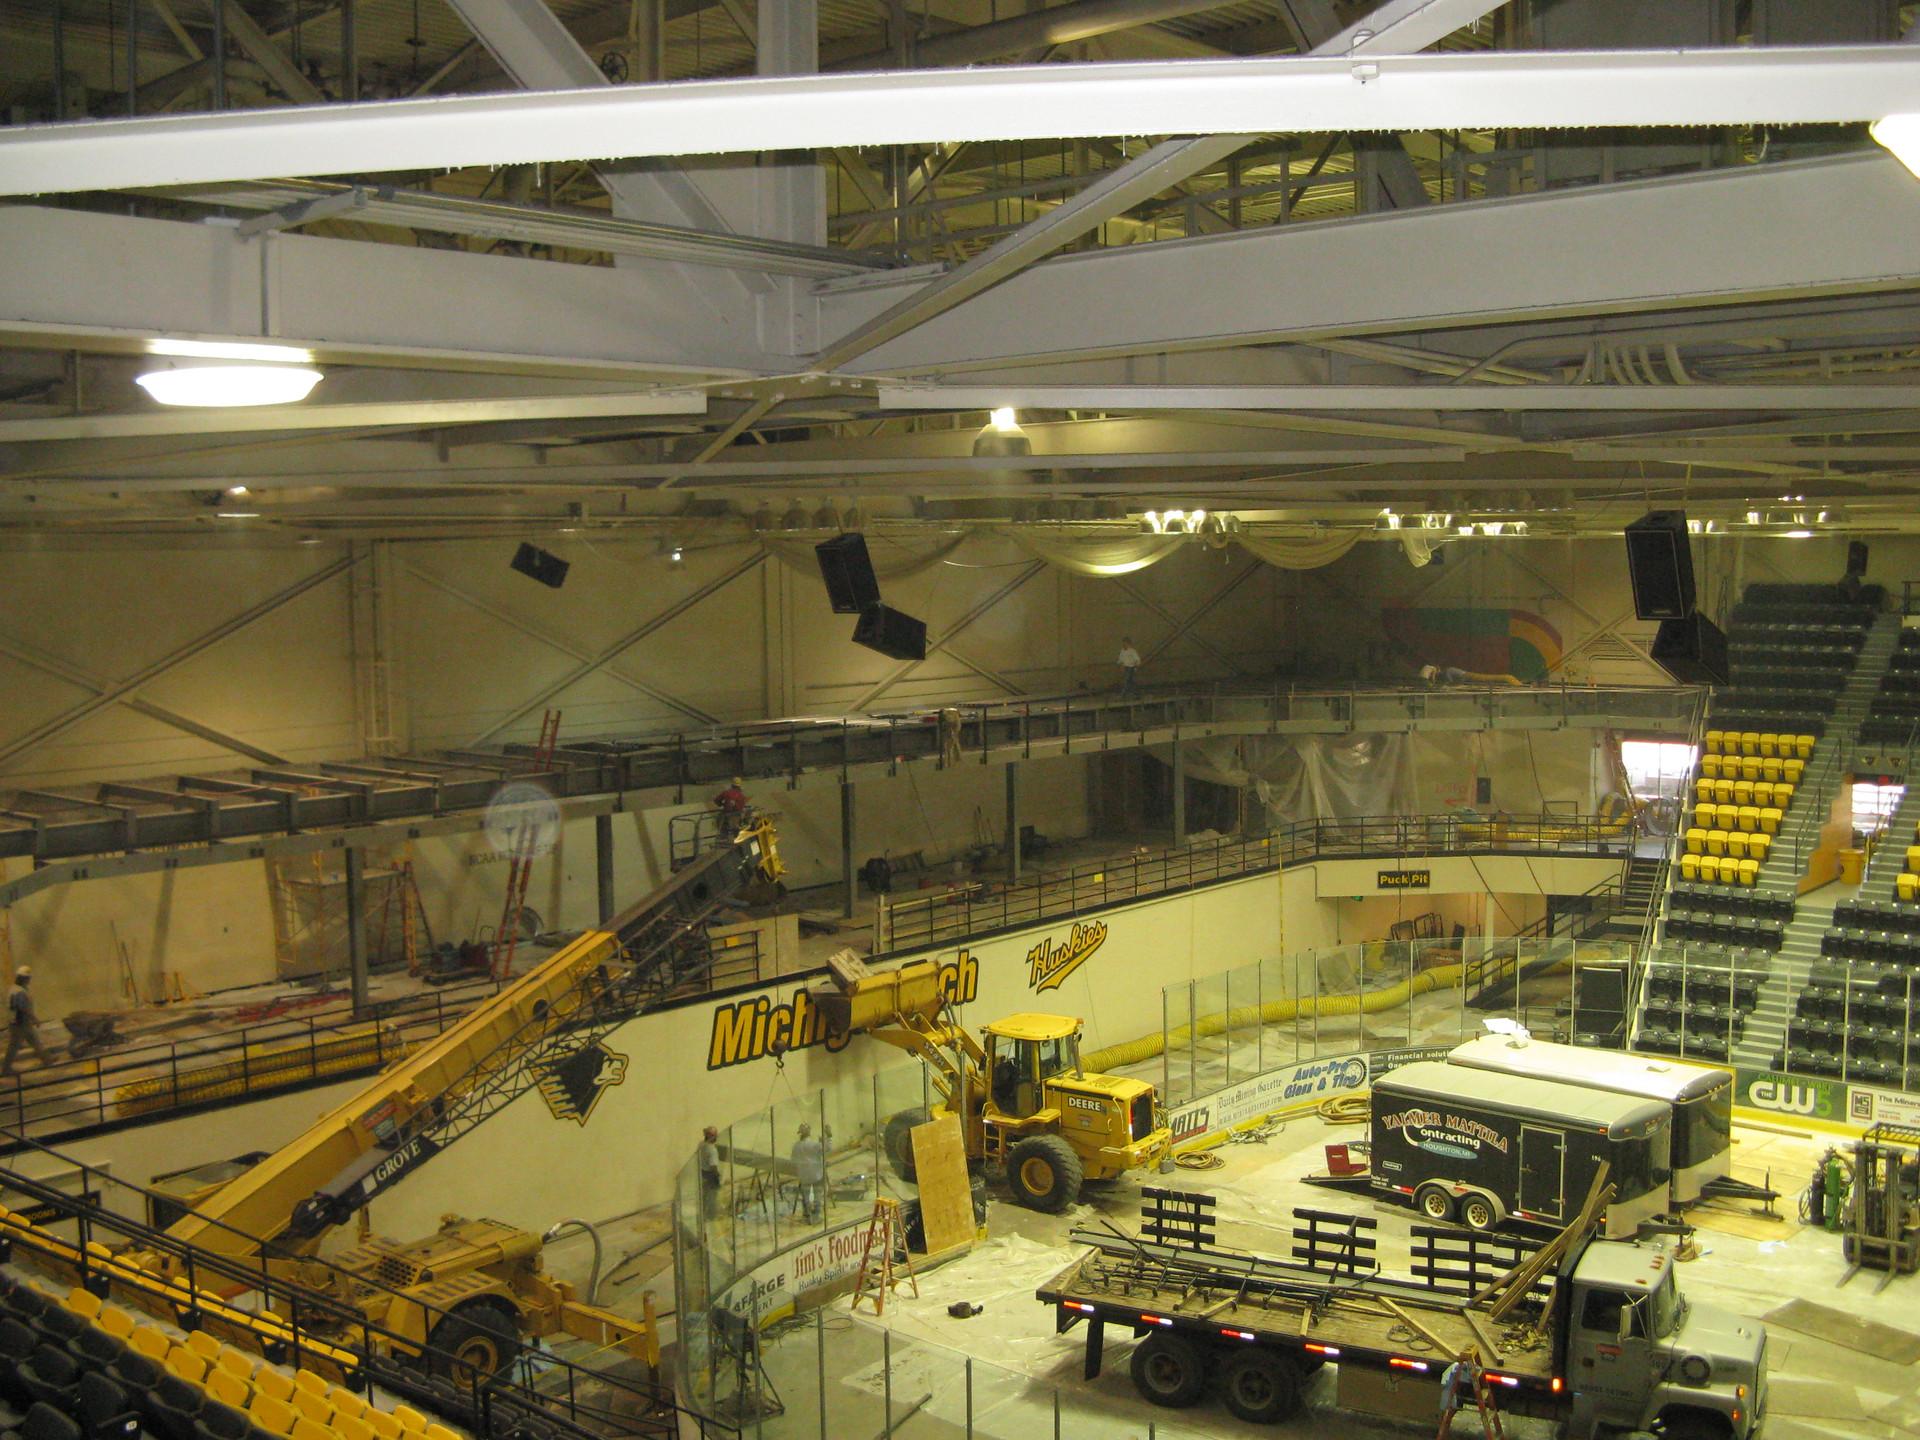 Michigan Tech Ice Arena Renovations (Houghton, MI)